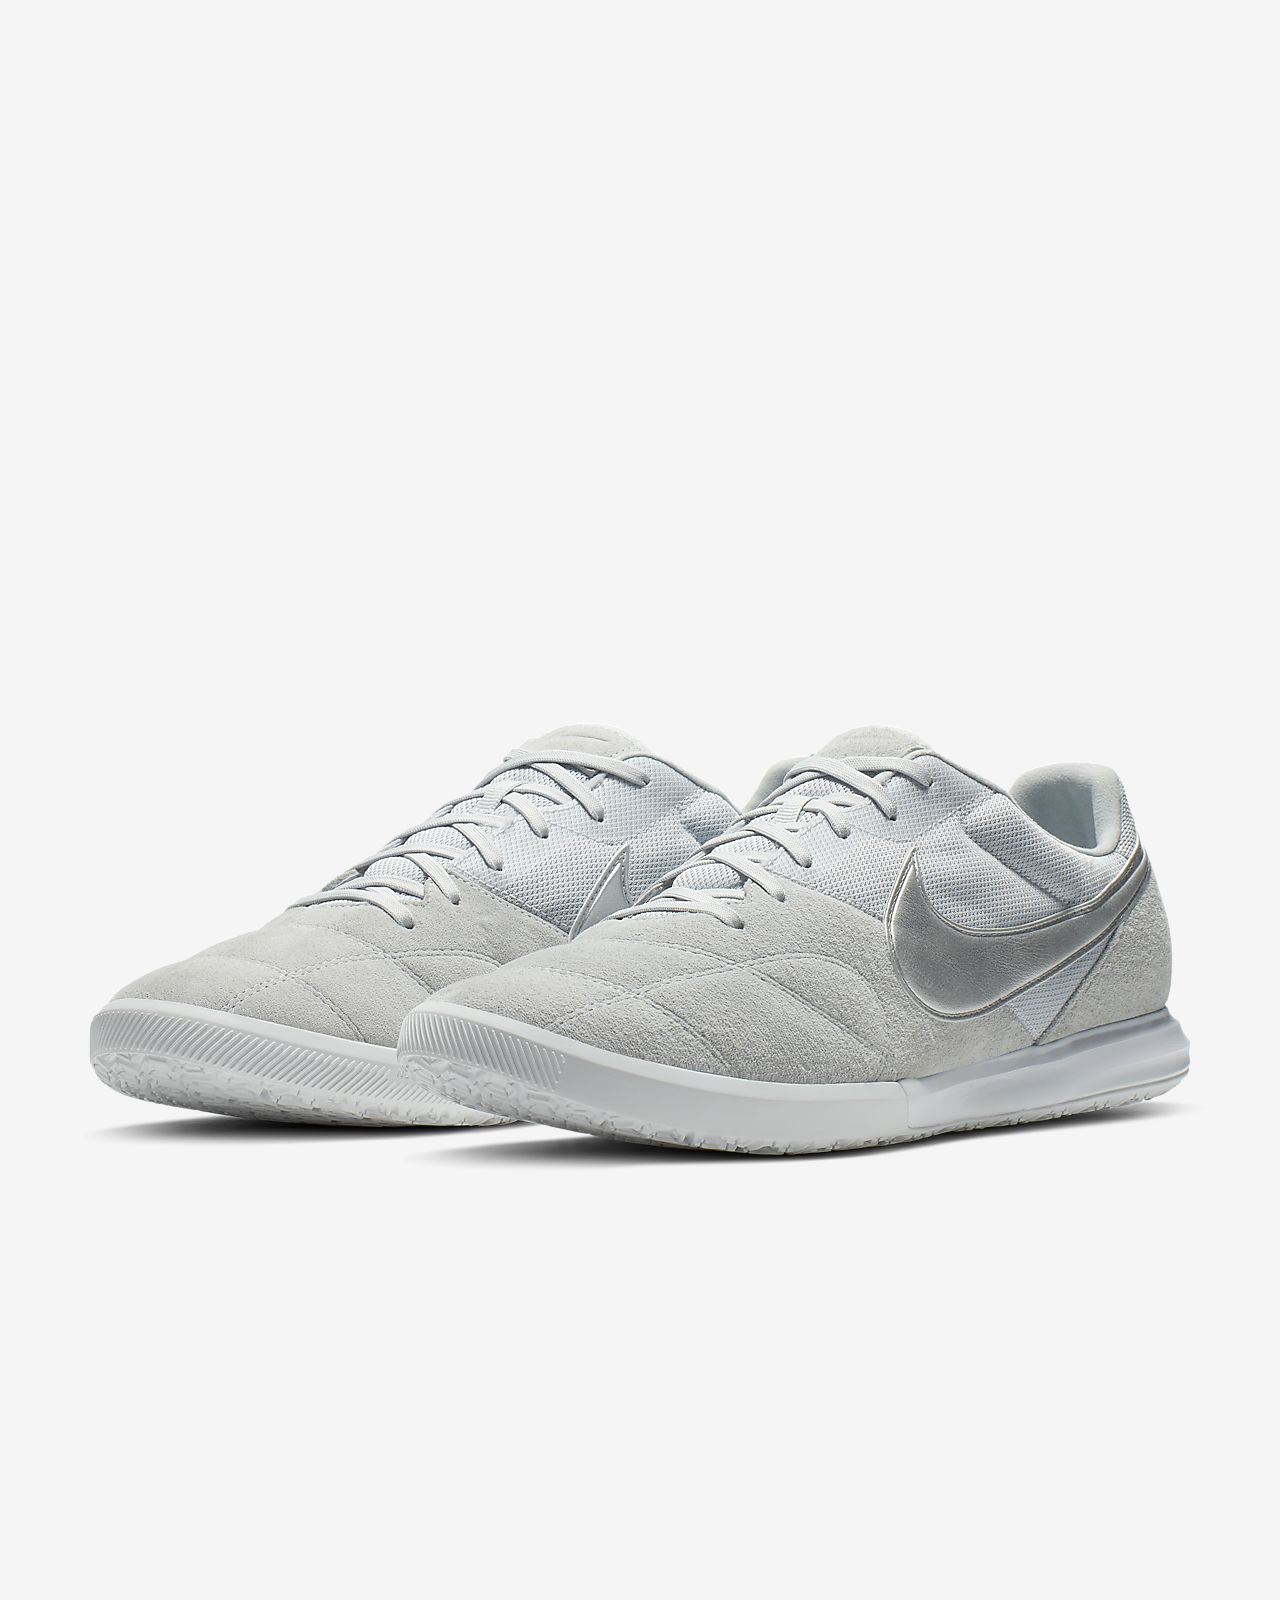 5e6fd509f Nike Tiempo Premier II Sala Indoor Court Soccer Shoe. Nike.com